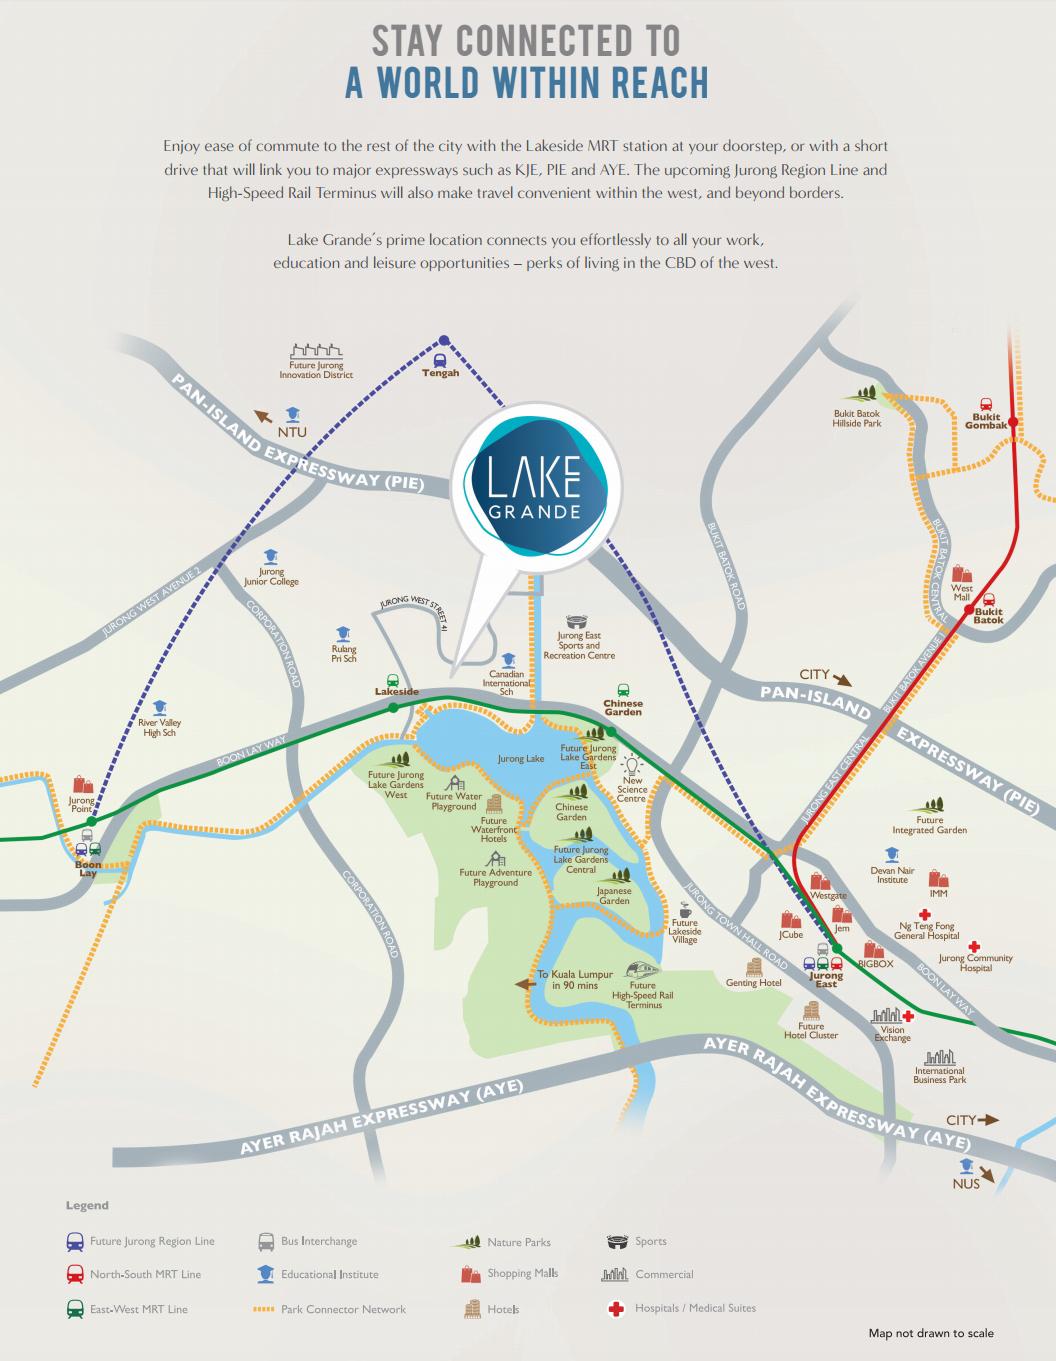 lake-grande-location-map